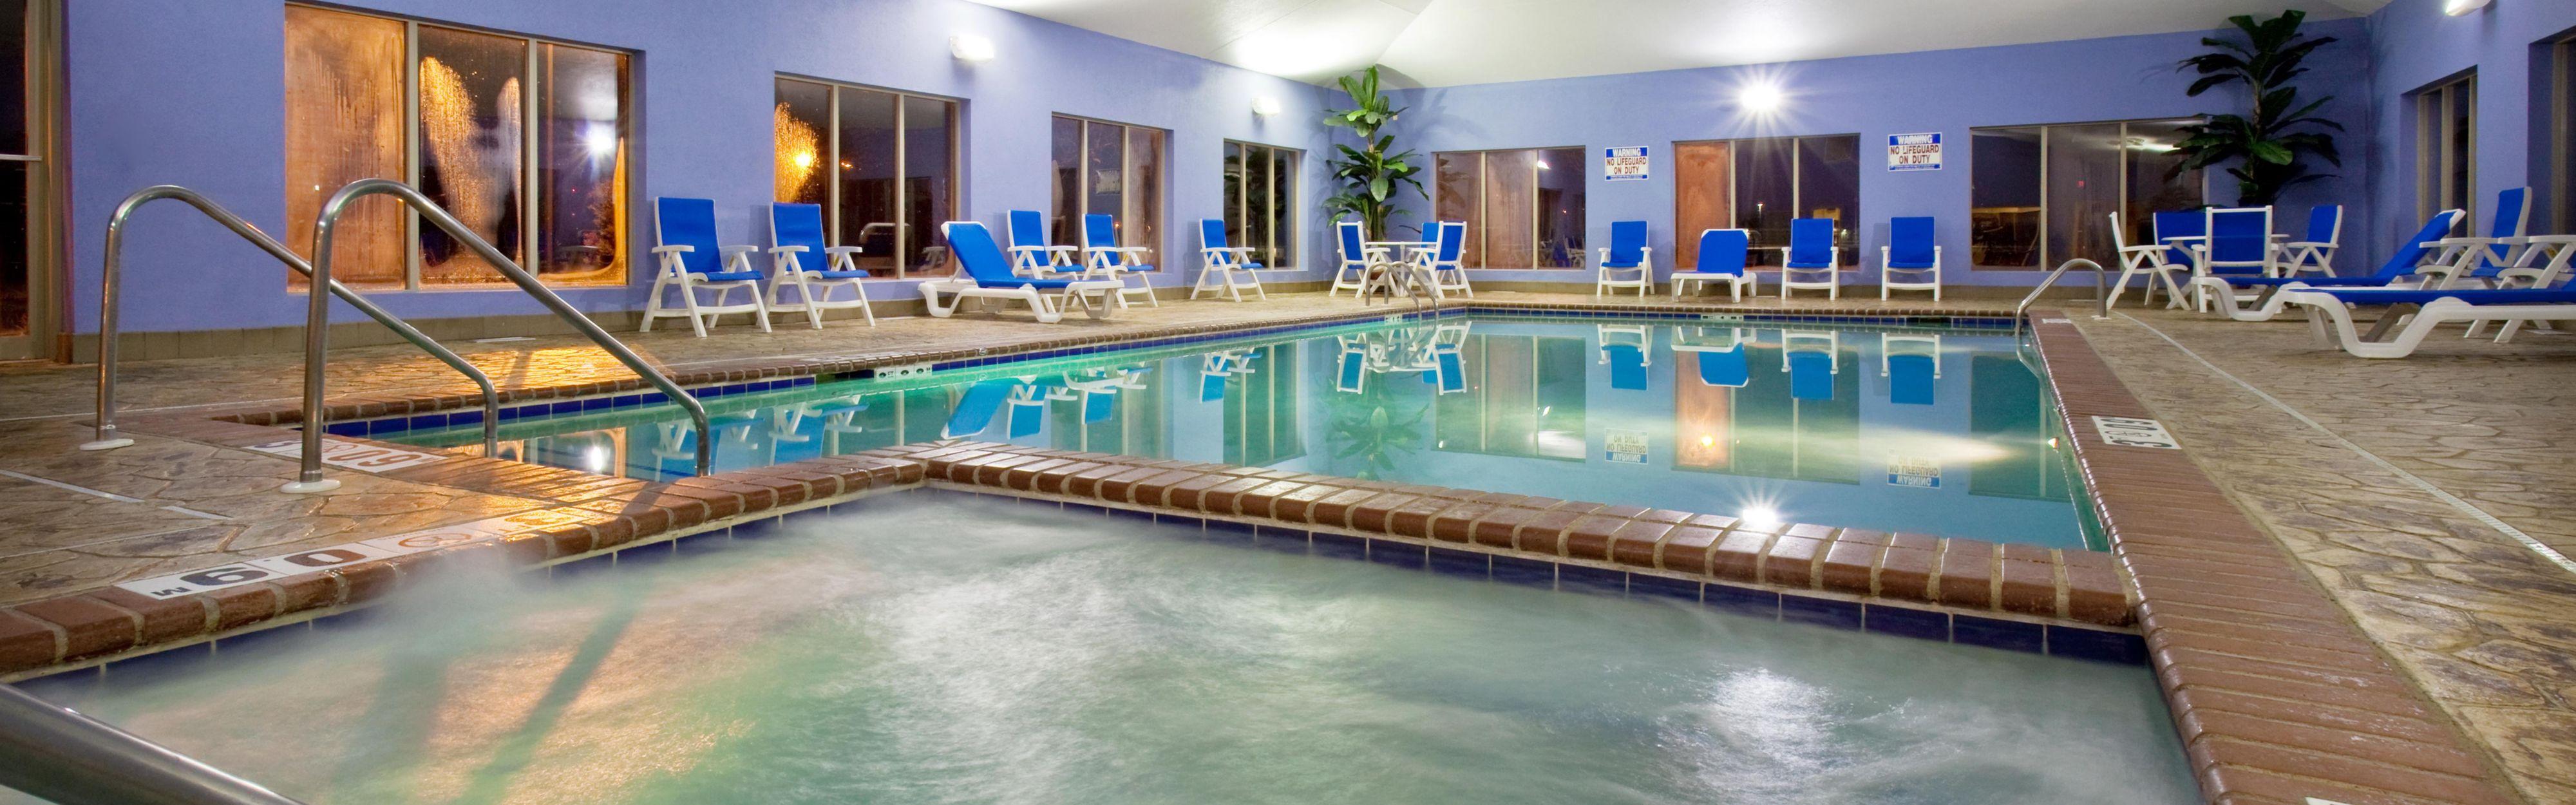 Holiday Inn Express & Suites Pleasant Prairie / Kenosha image 2